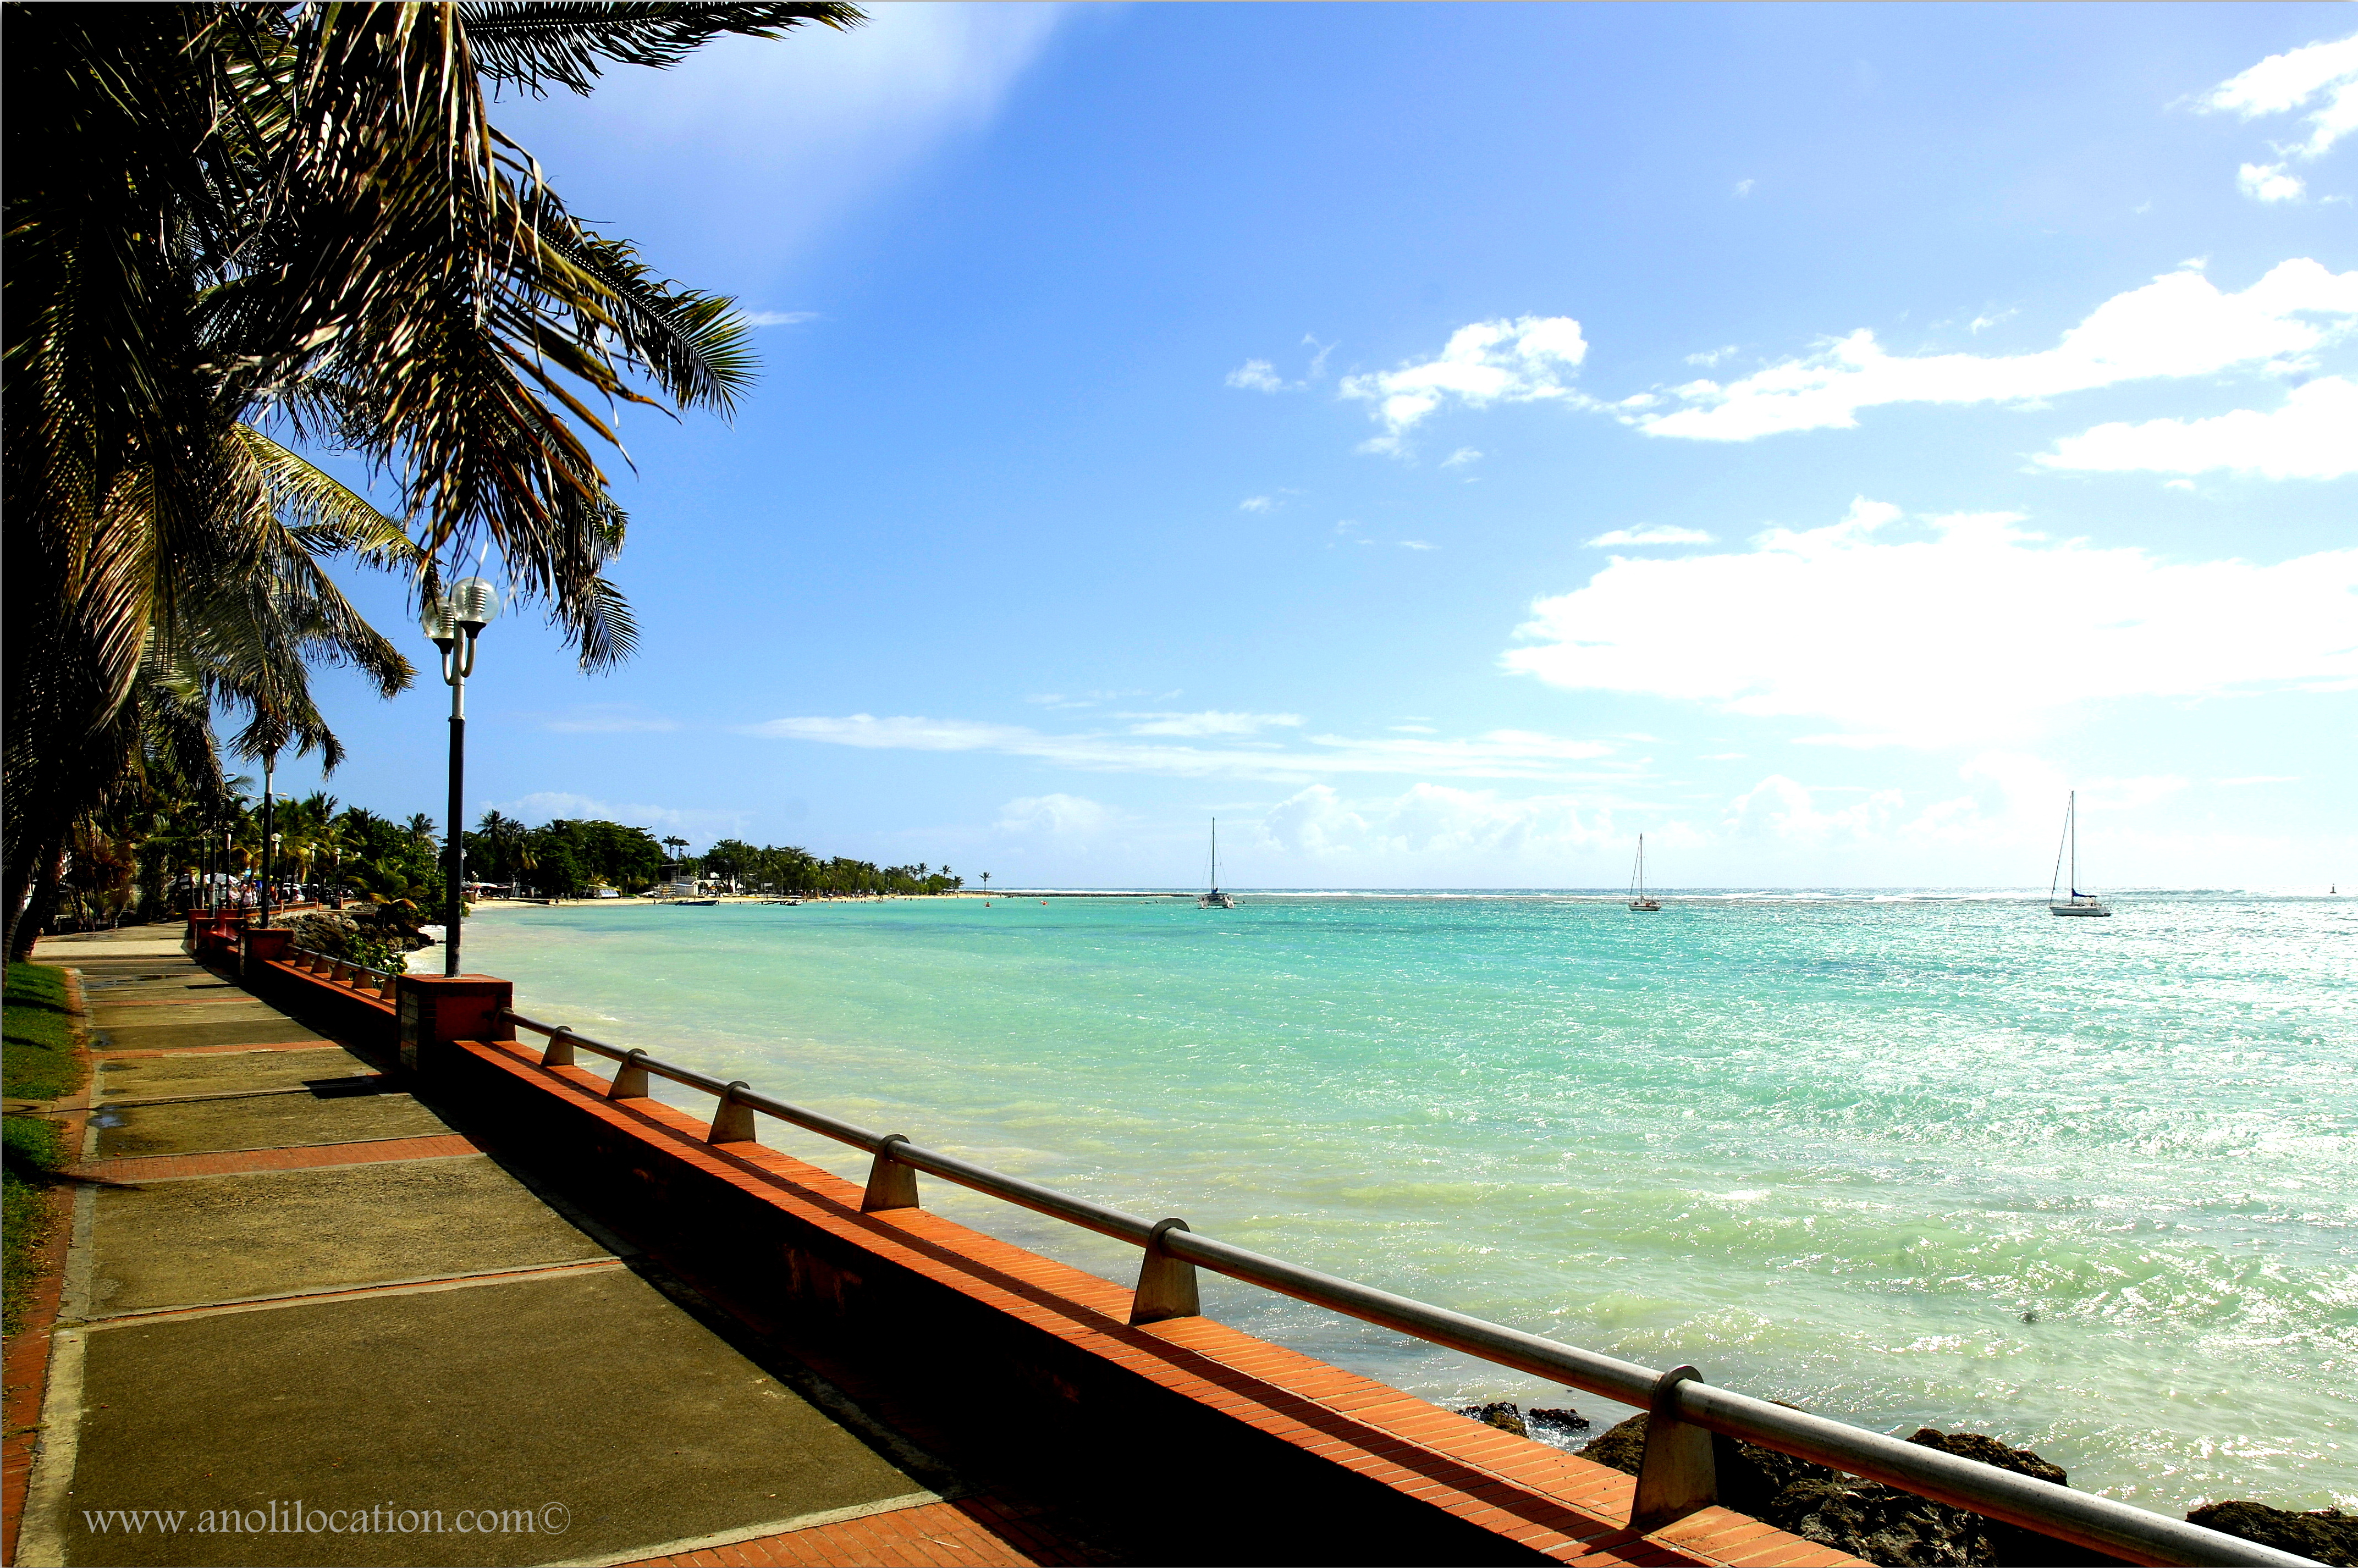 Anoli Location_Baie de Sainte Anne_Guadeloupe